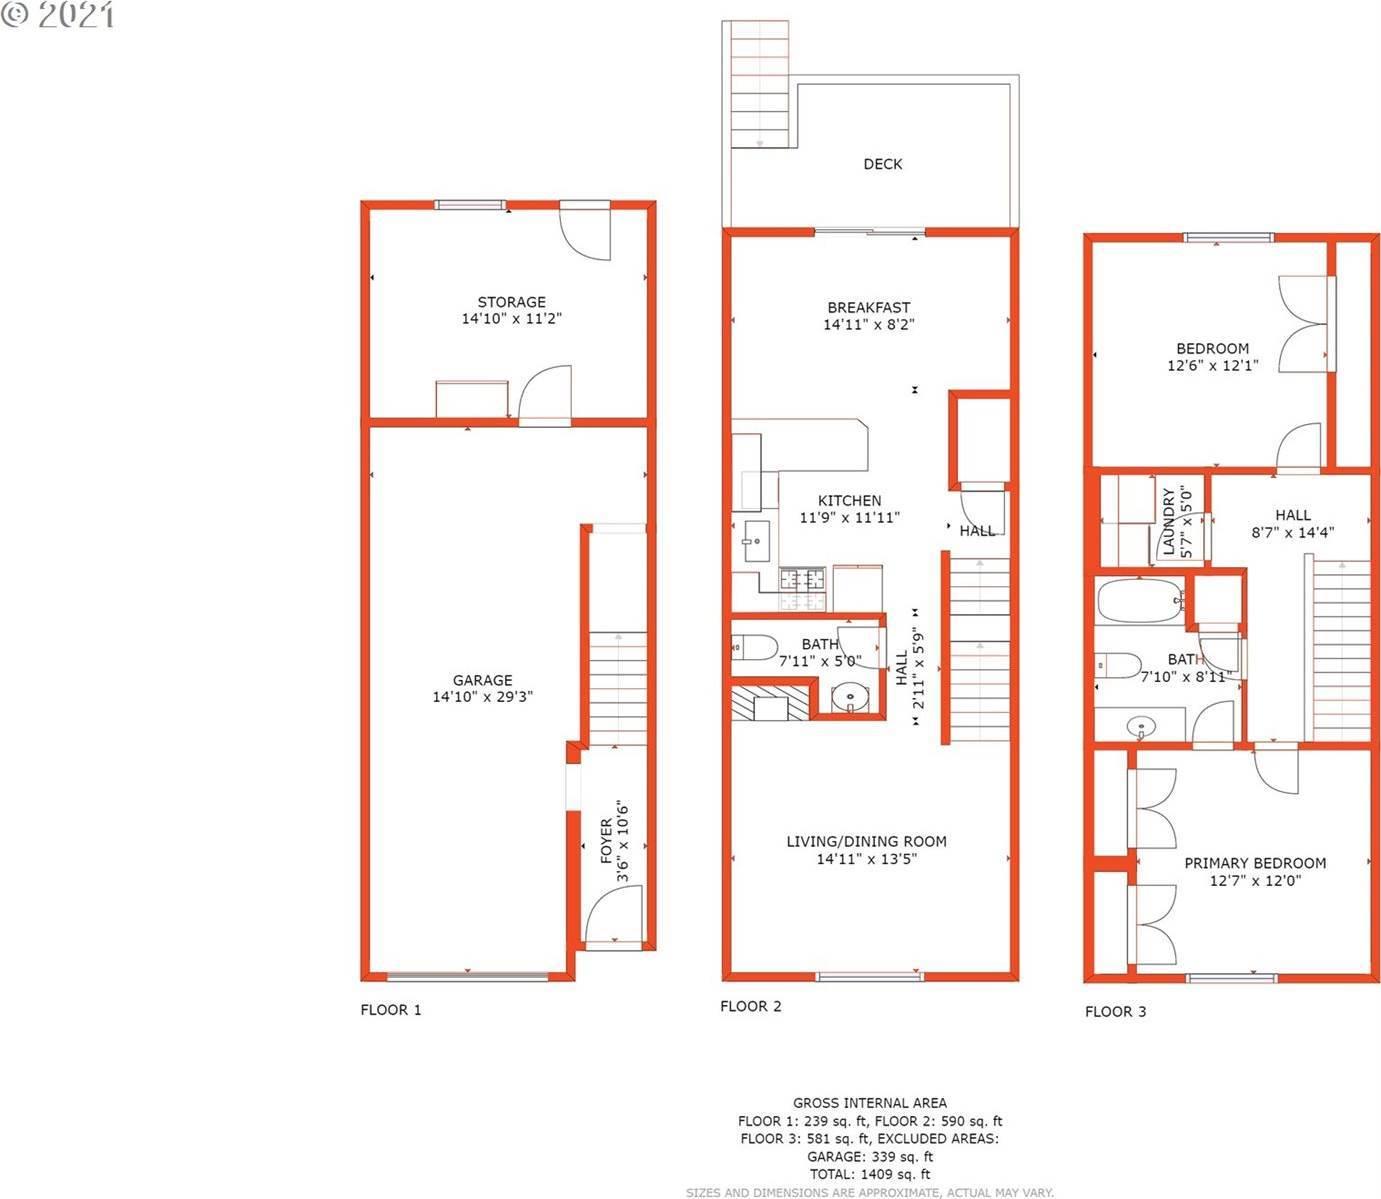 4241 SW 3RD St, Gresham, OR 97030